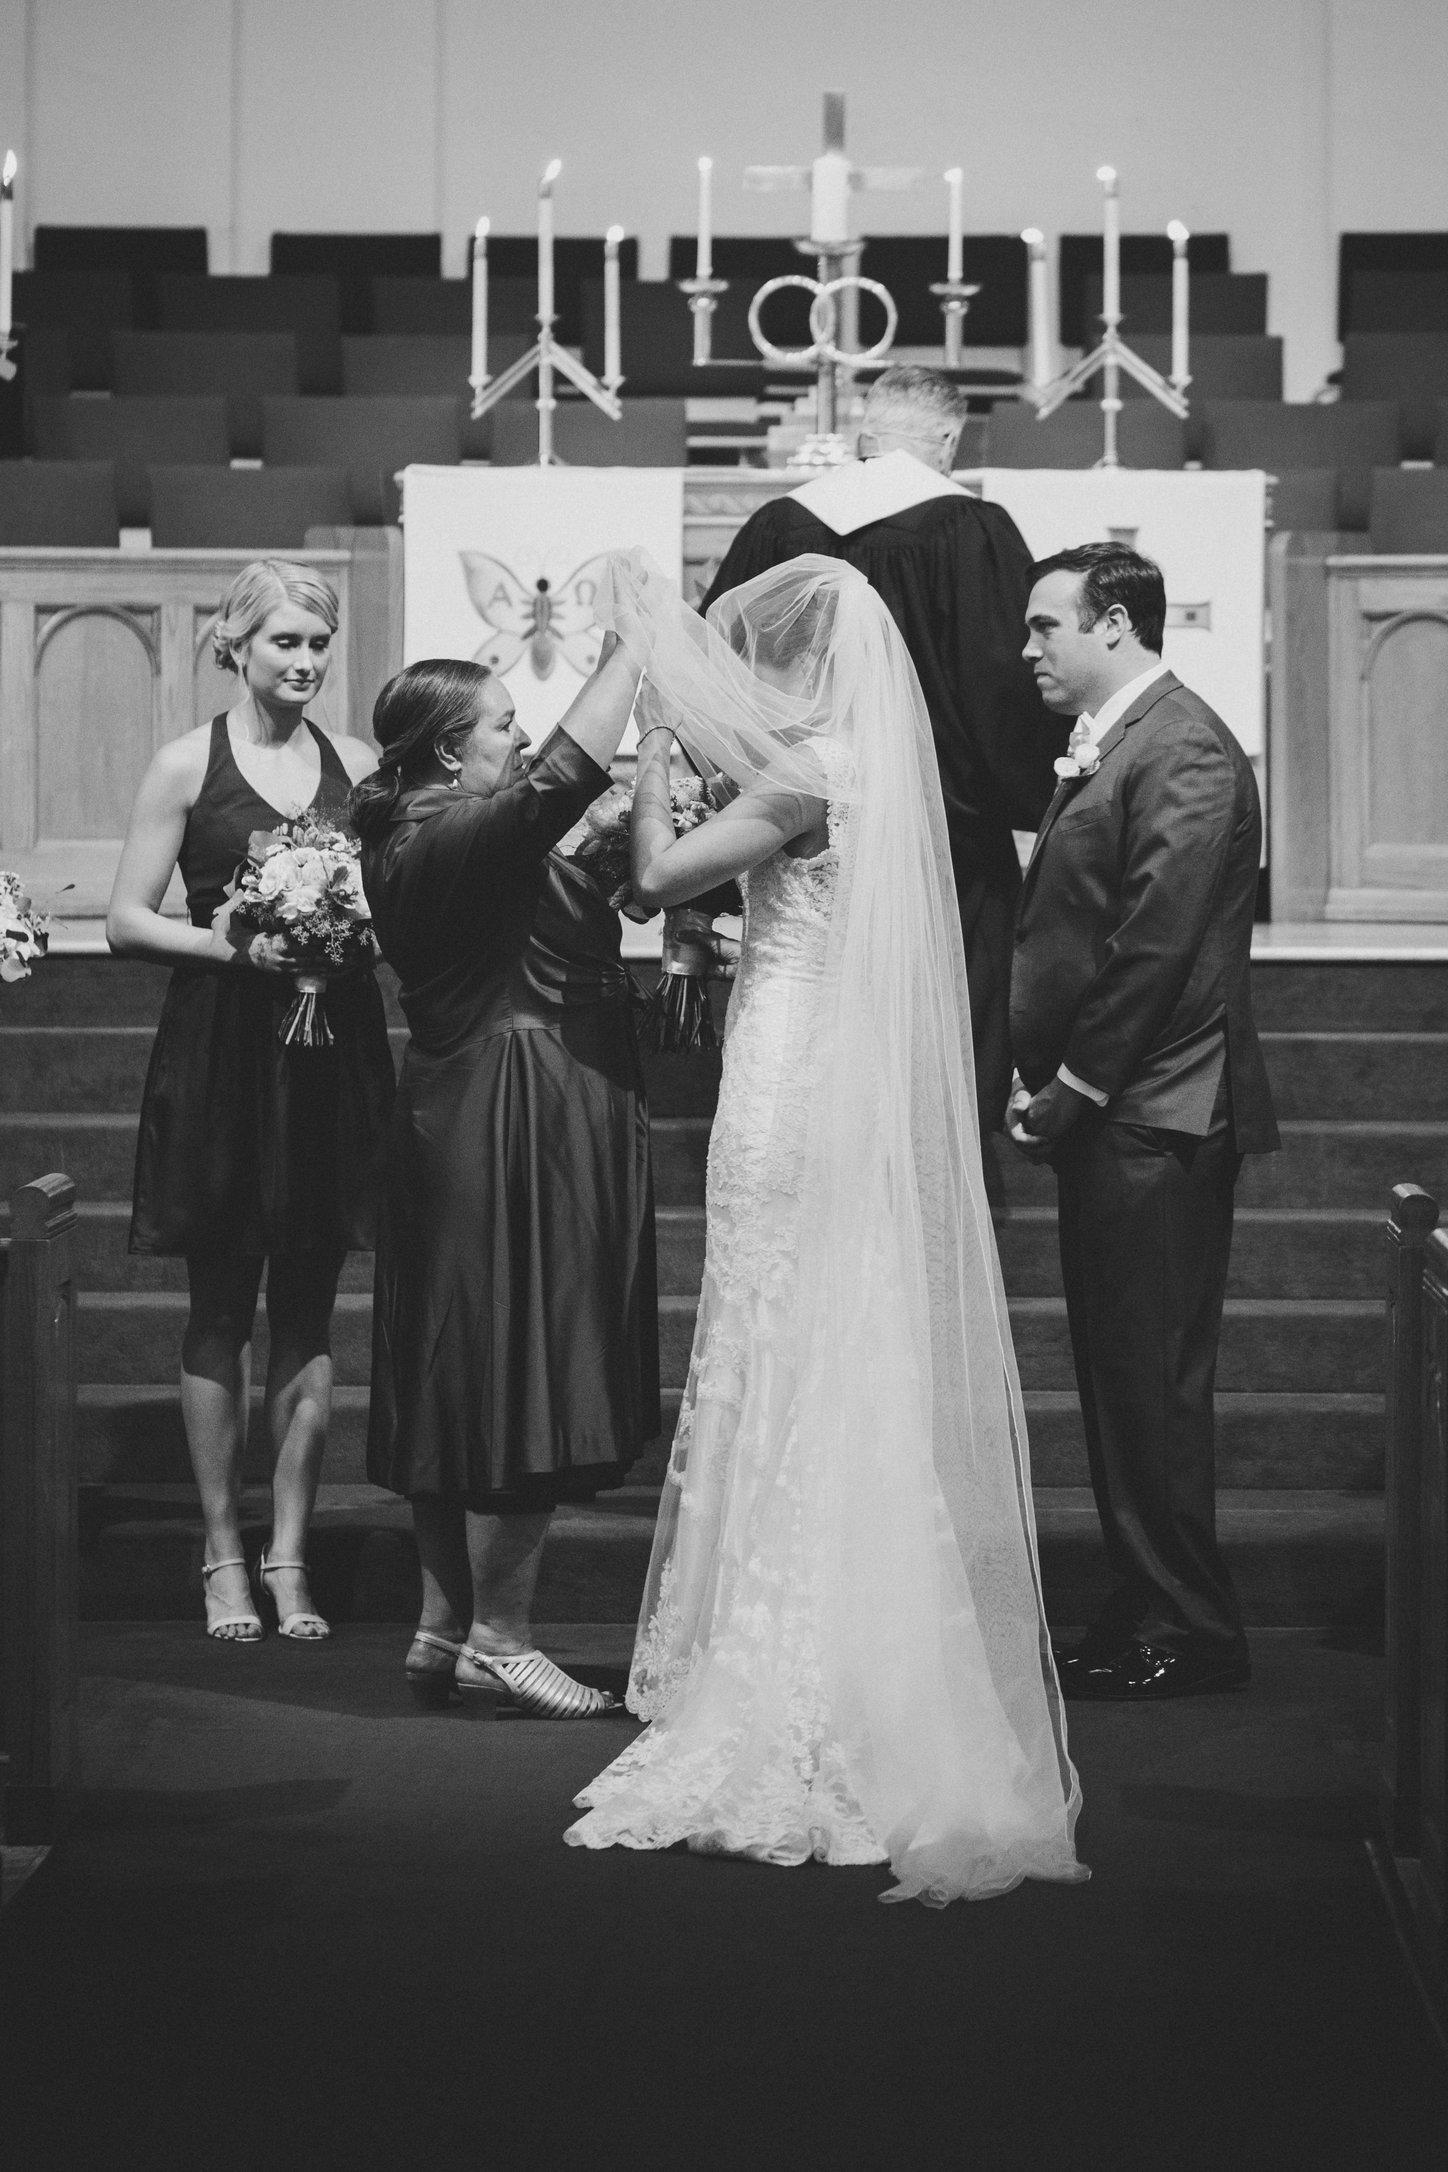 SandC-wedding-175.jpg